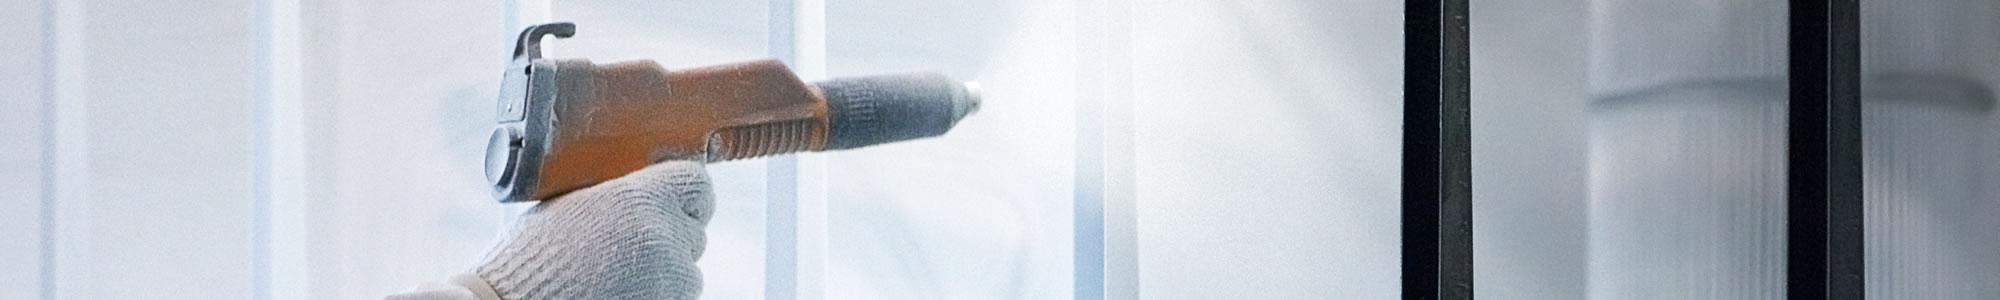 banner-powder-coating